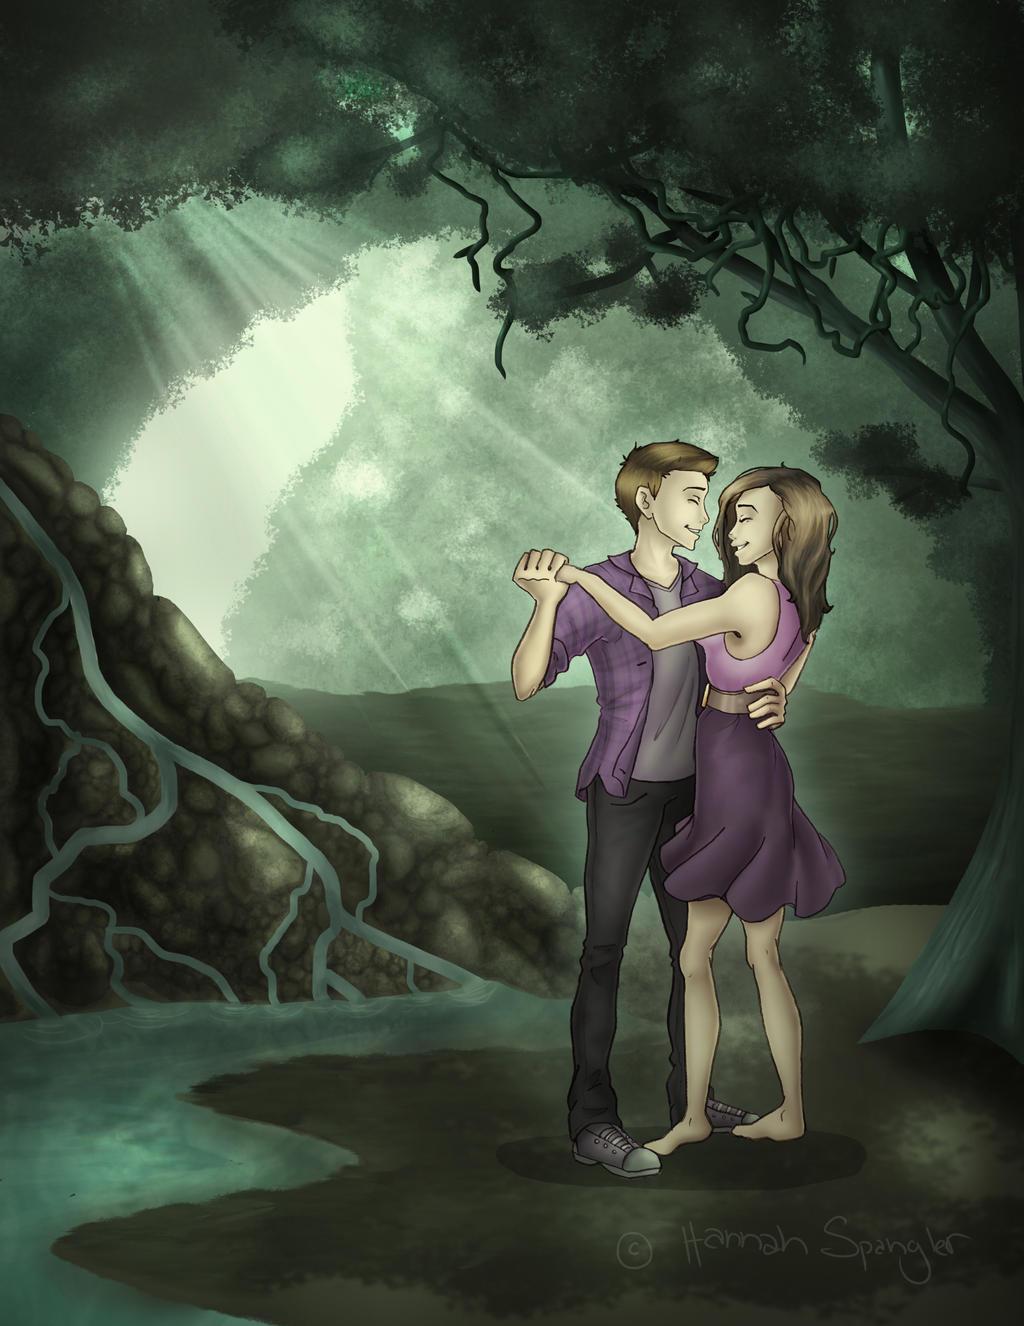 Forest Waltz by hannahspangler